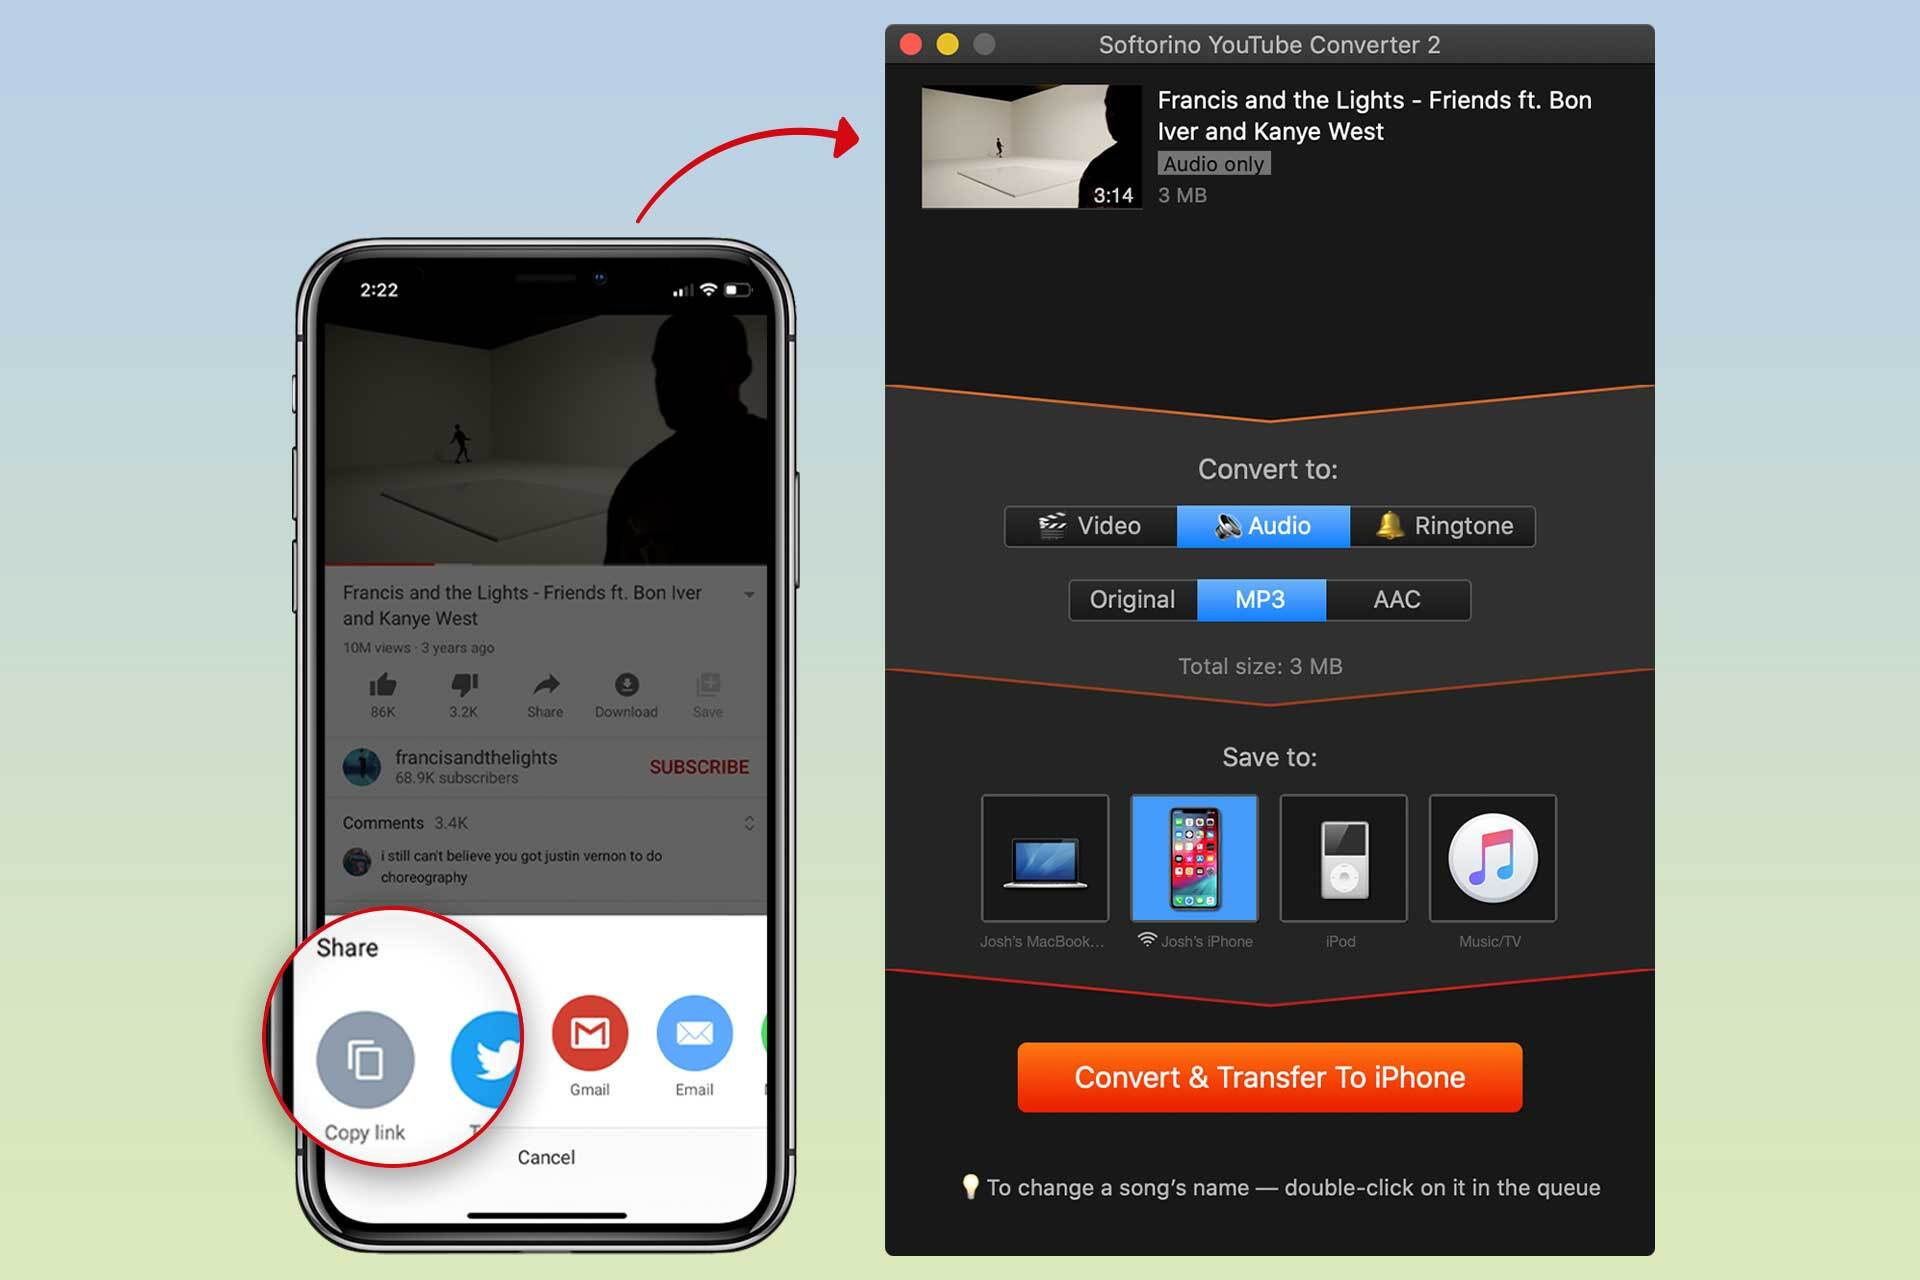 Convert YT videos to MP3